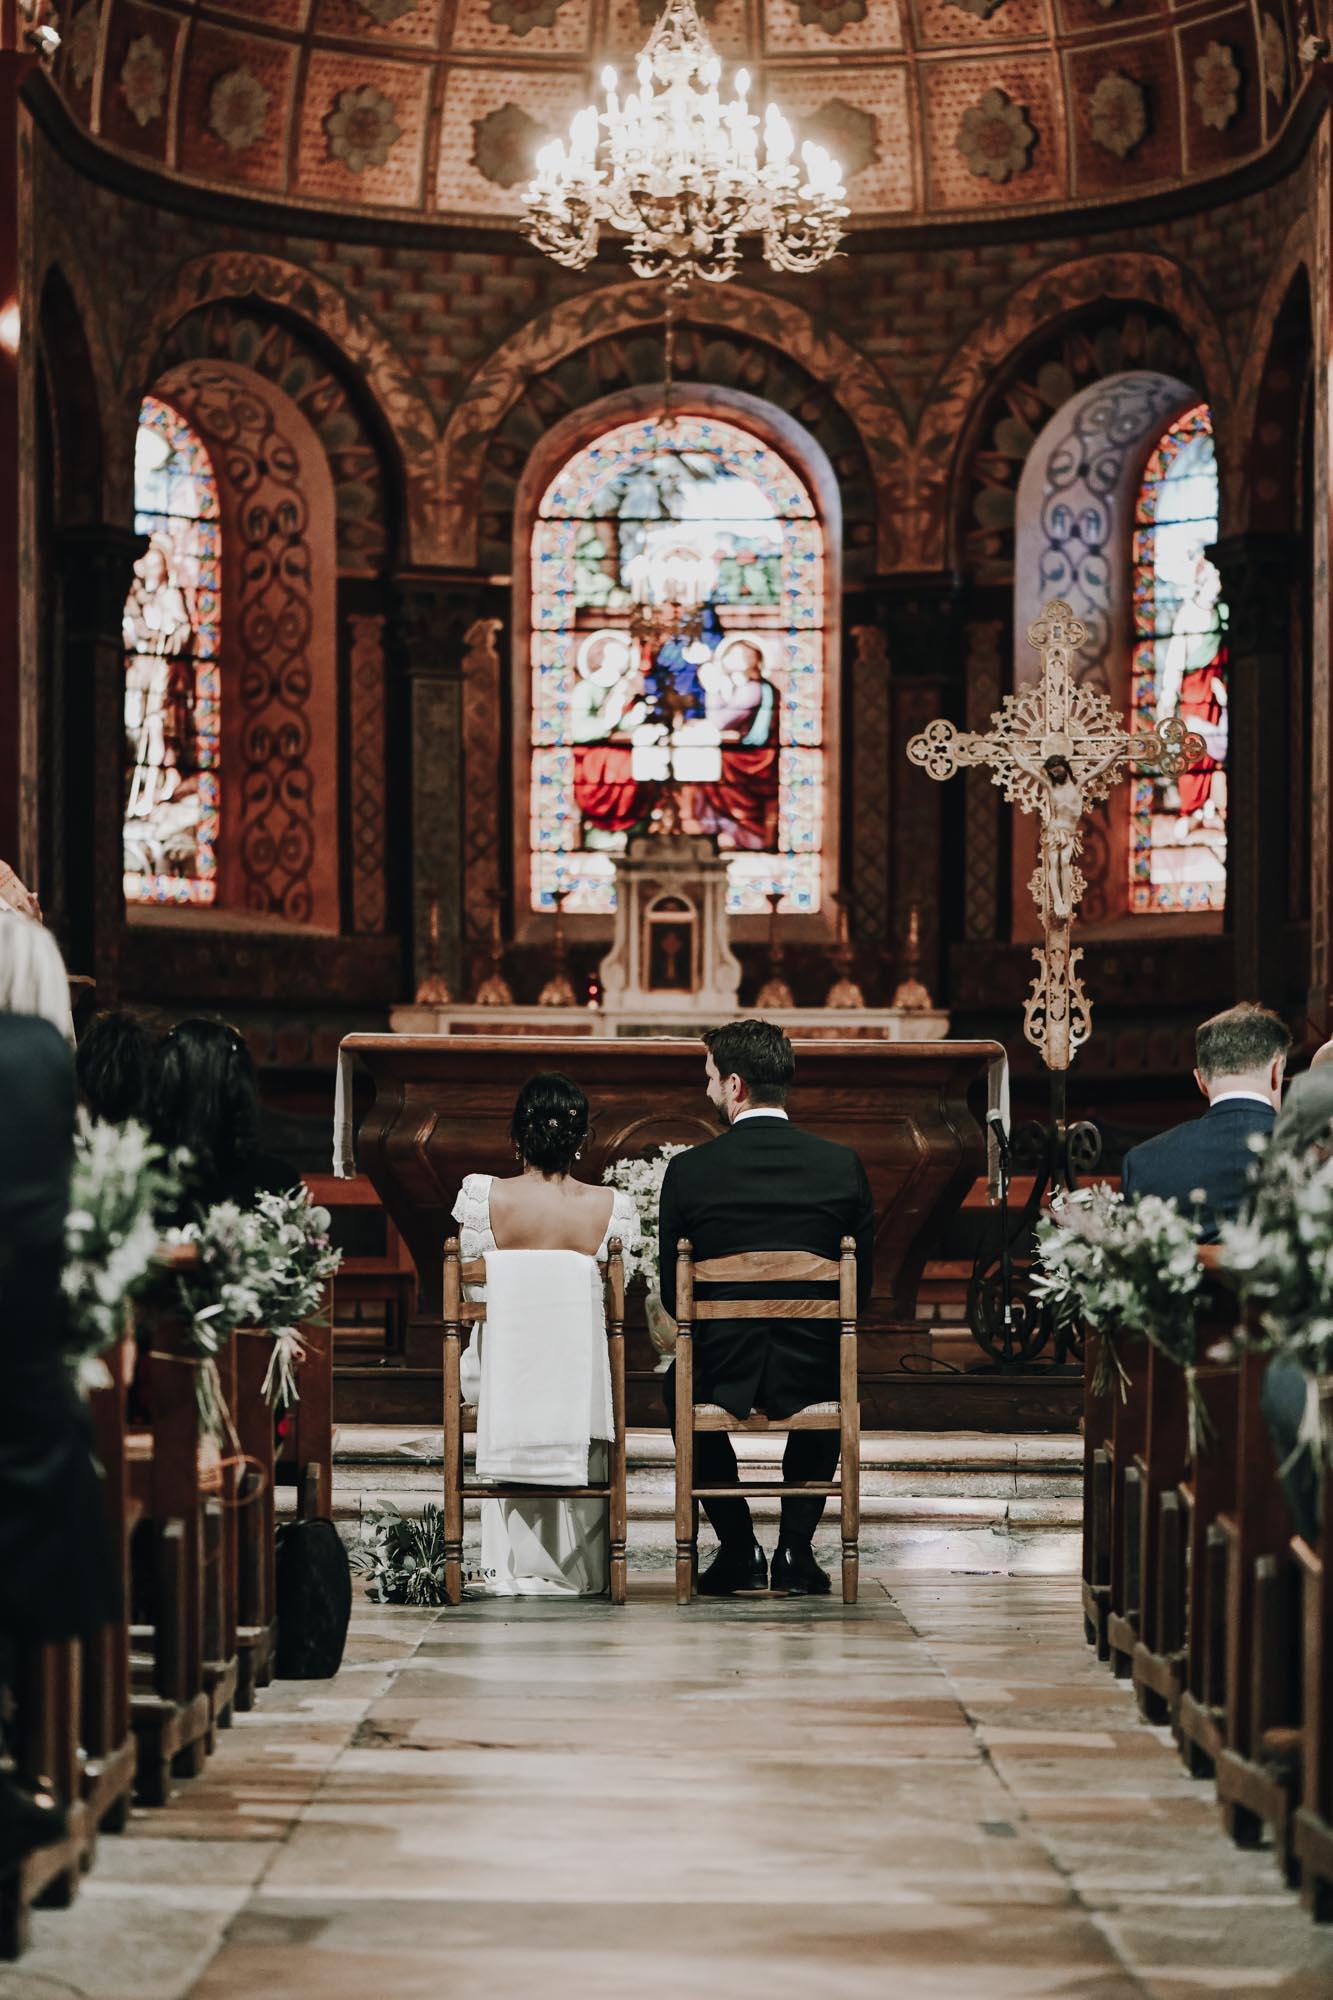 2018-09-08 - LD8_5463 - photographe mariage lyon - laurie diaz - www.lauriediazweeding.com.jpg